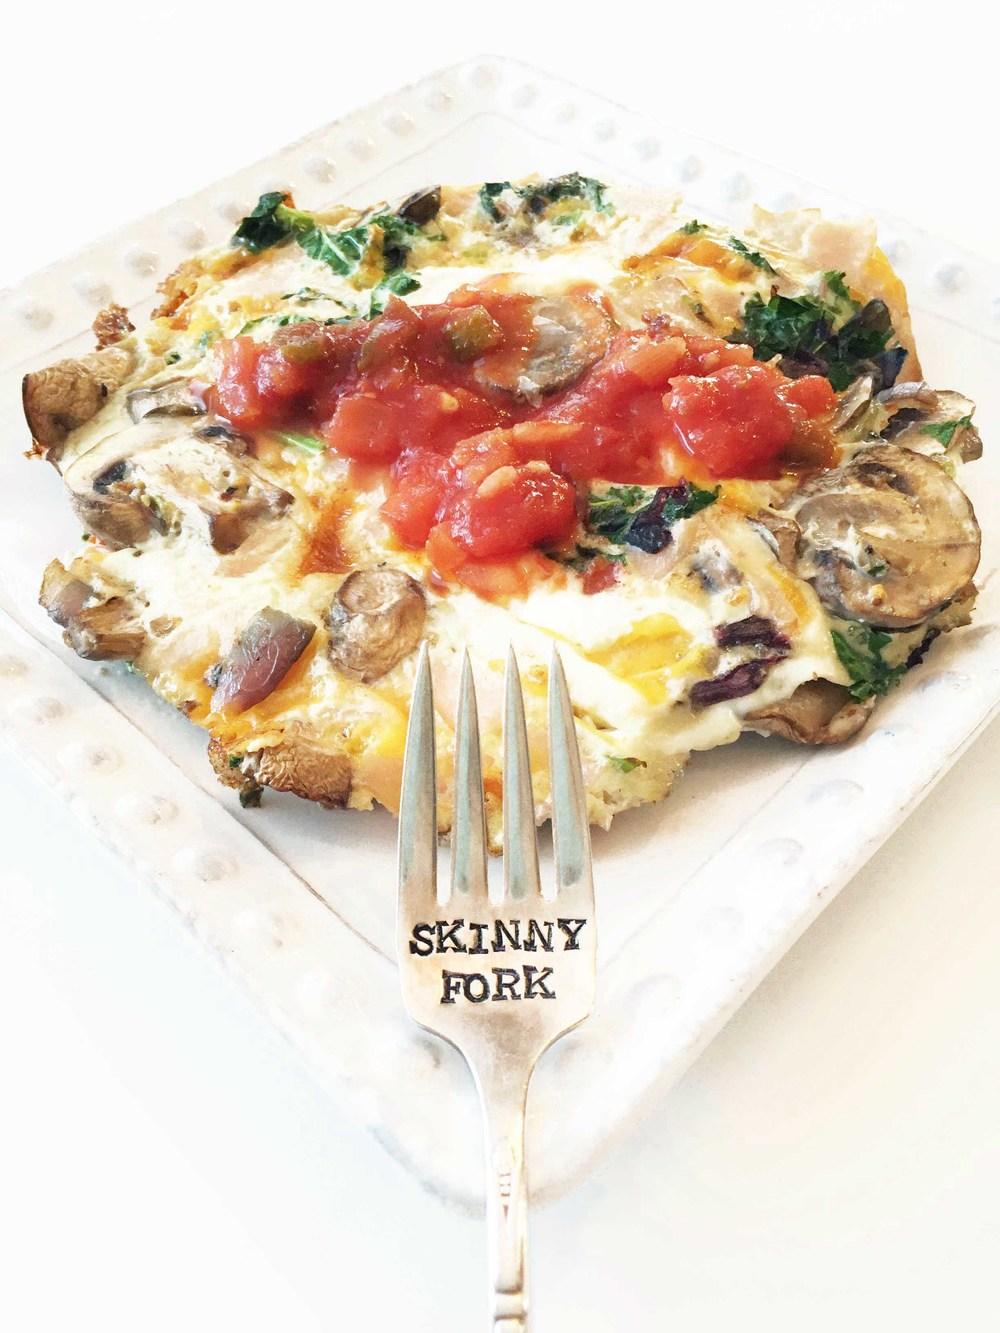 Everything Omlettata — The Skinny Fork